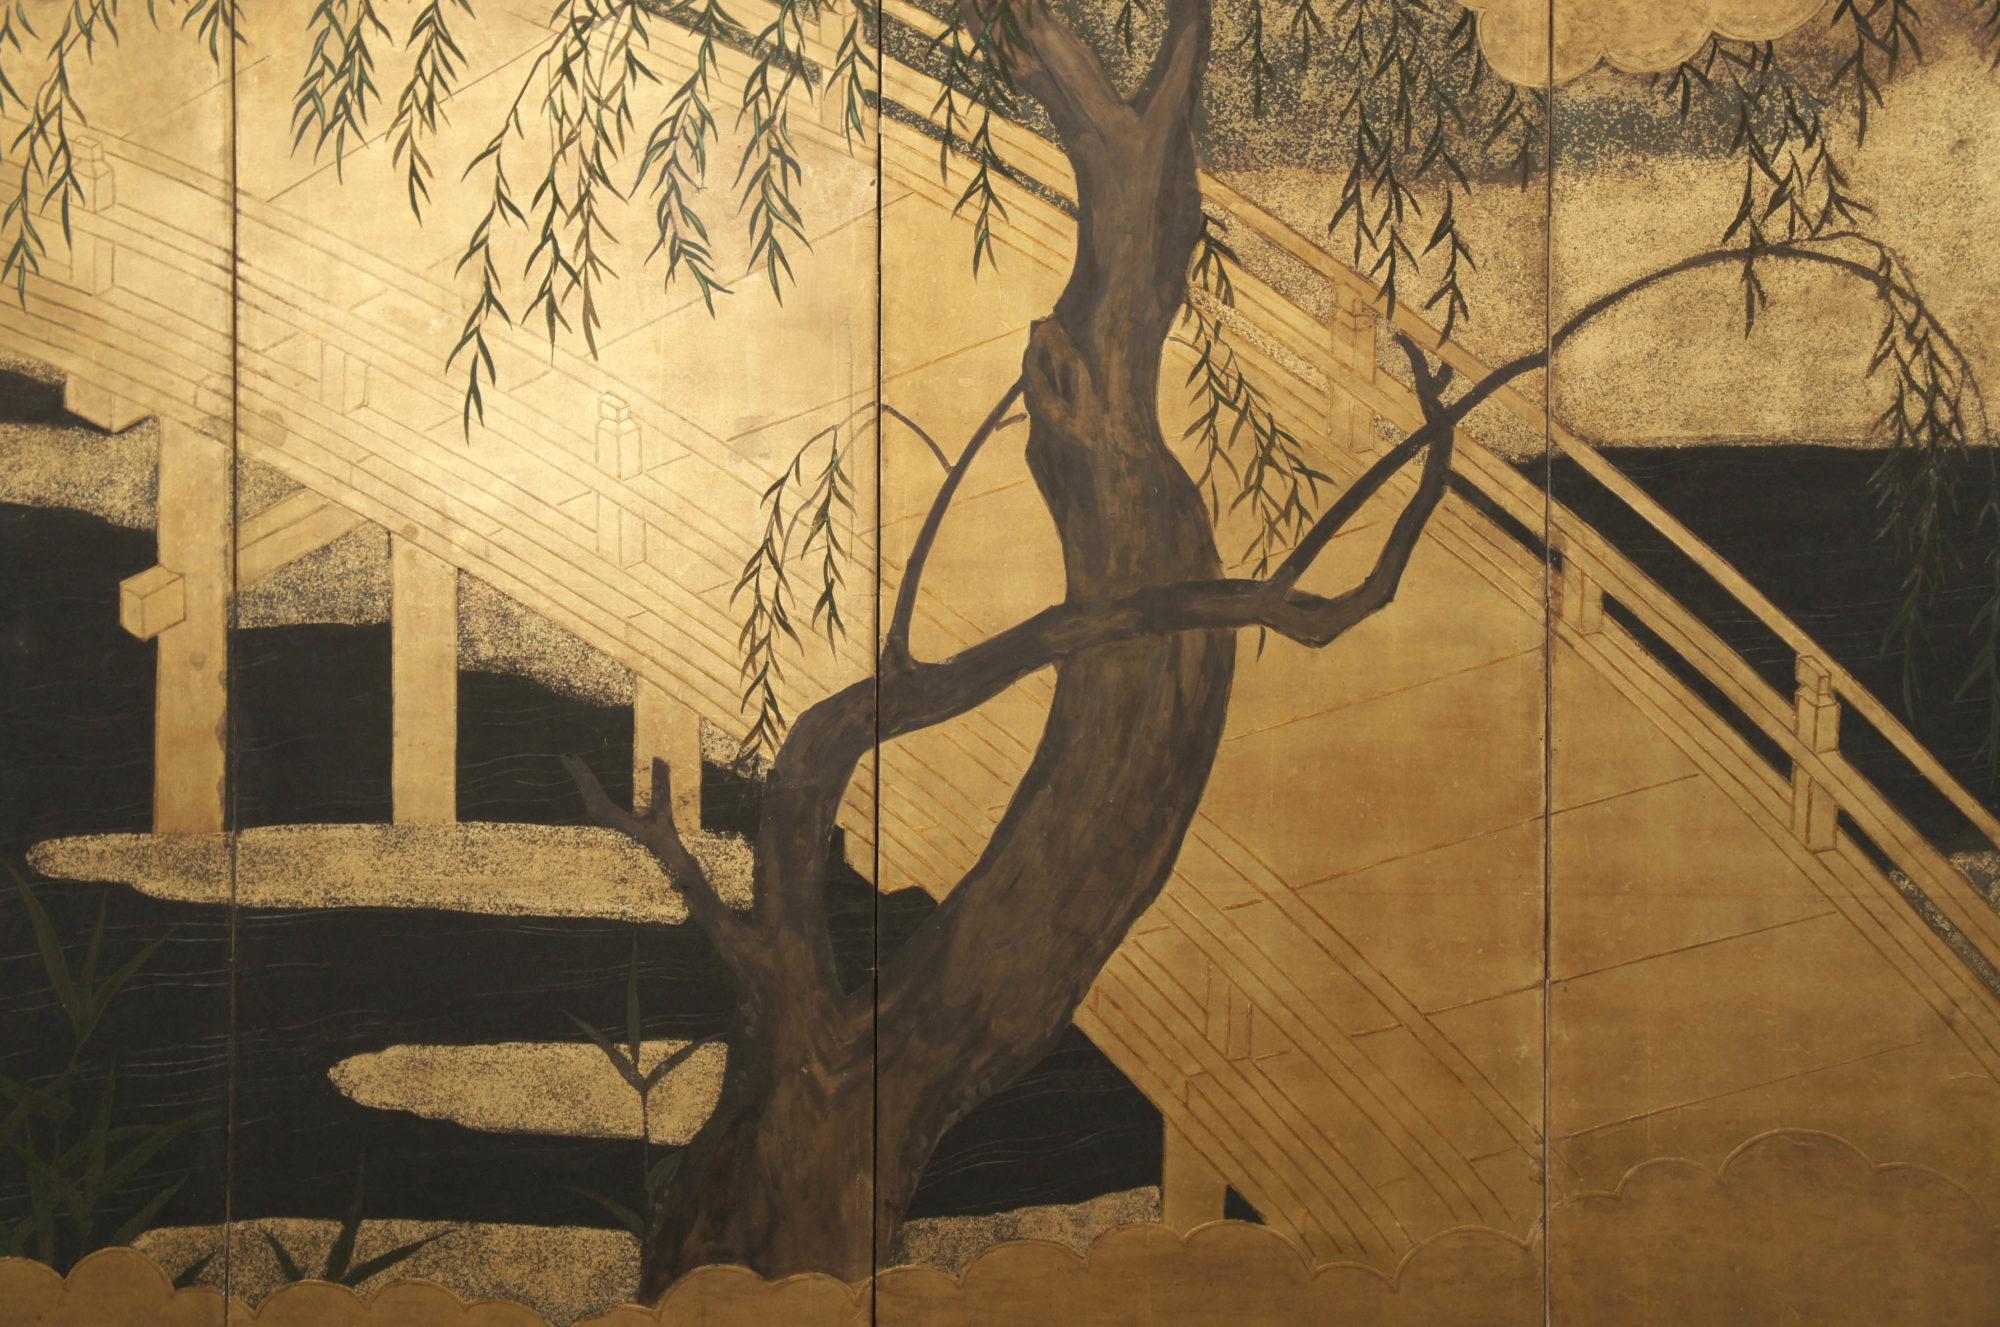 Japanese Six Panel Screen: Uji Bridge with Herons and Summer Willow